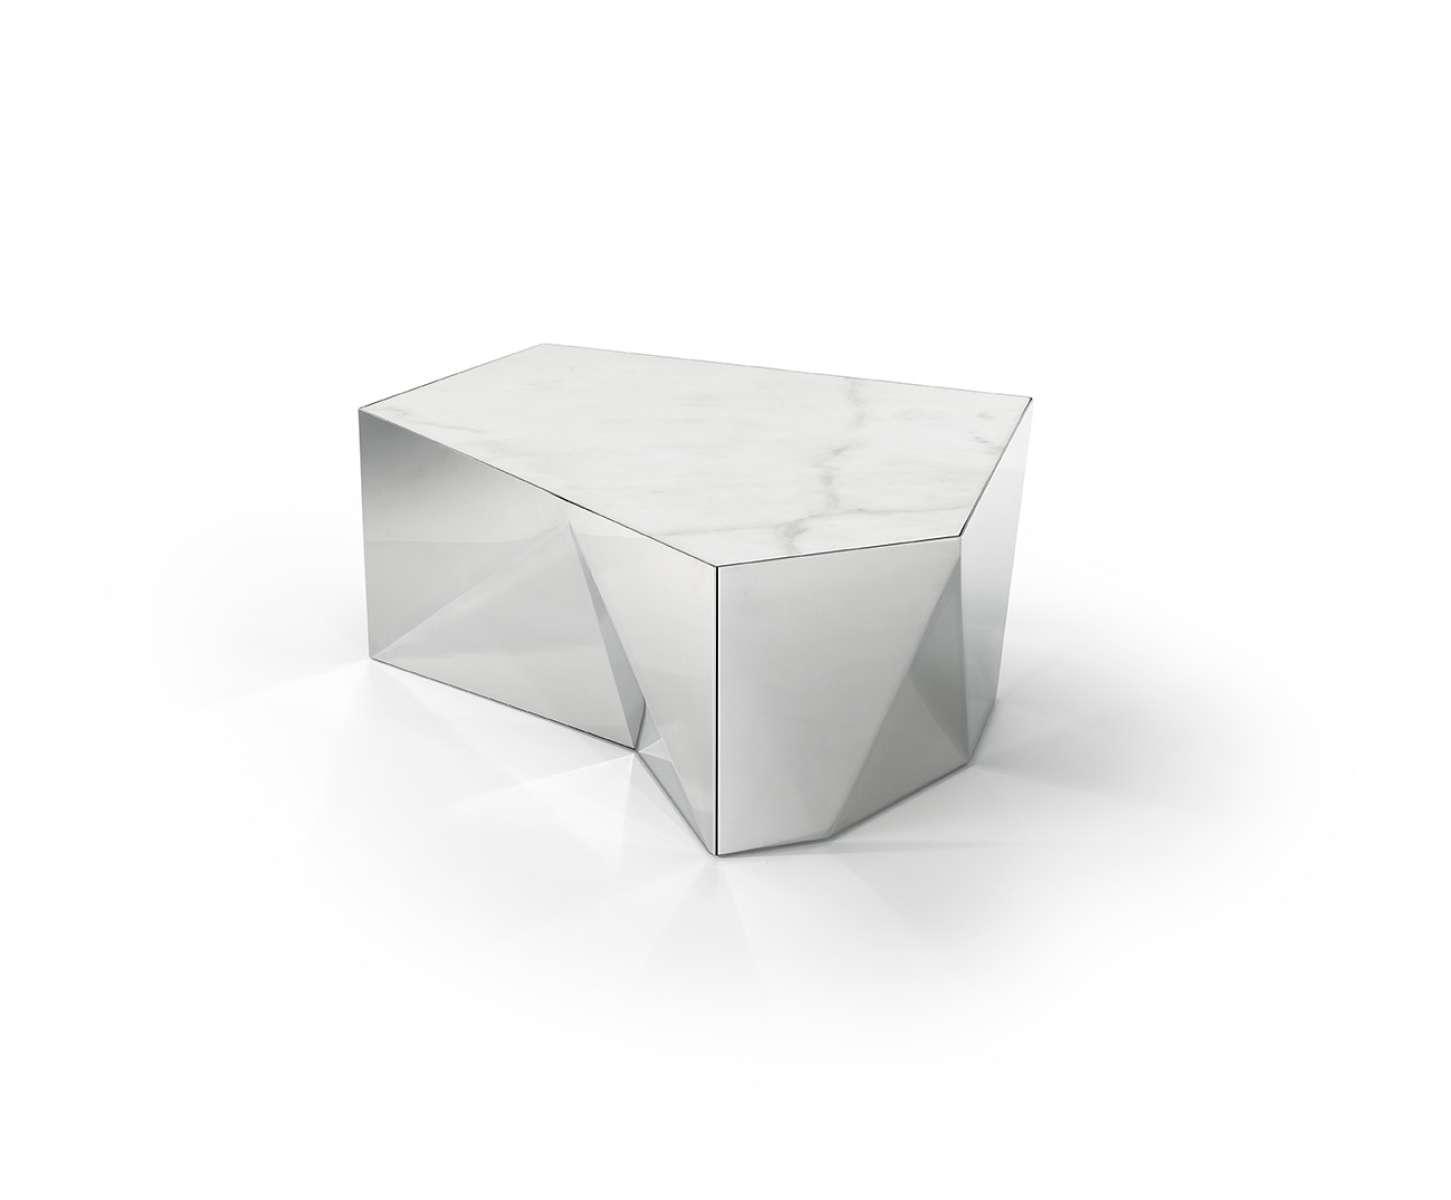 Studio Marco Piva – Product design – 404